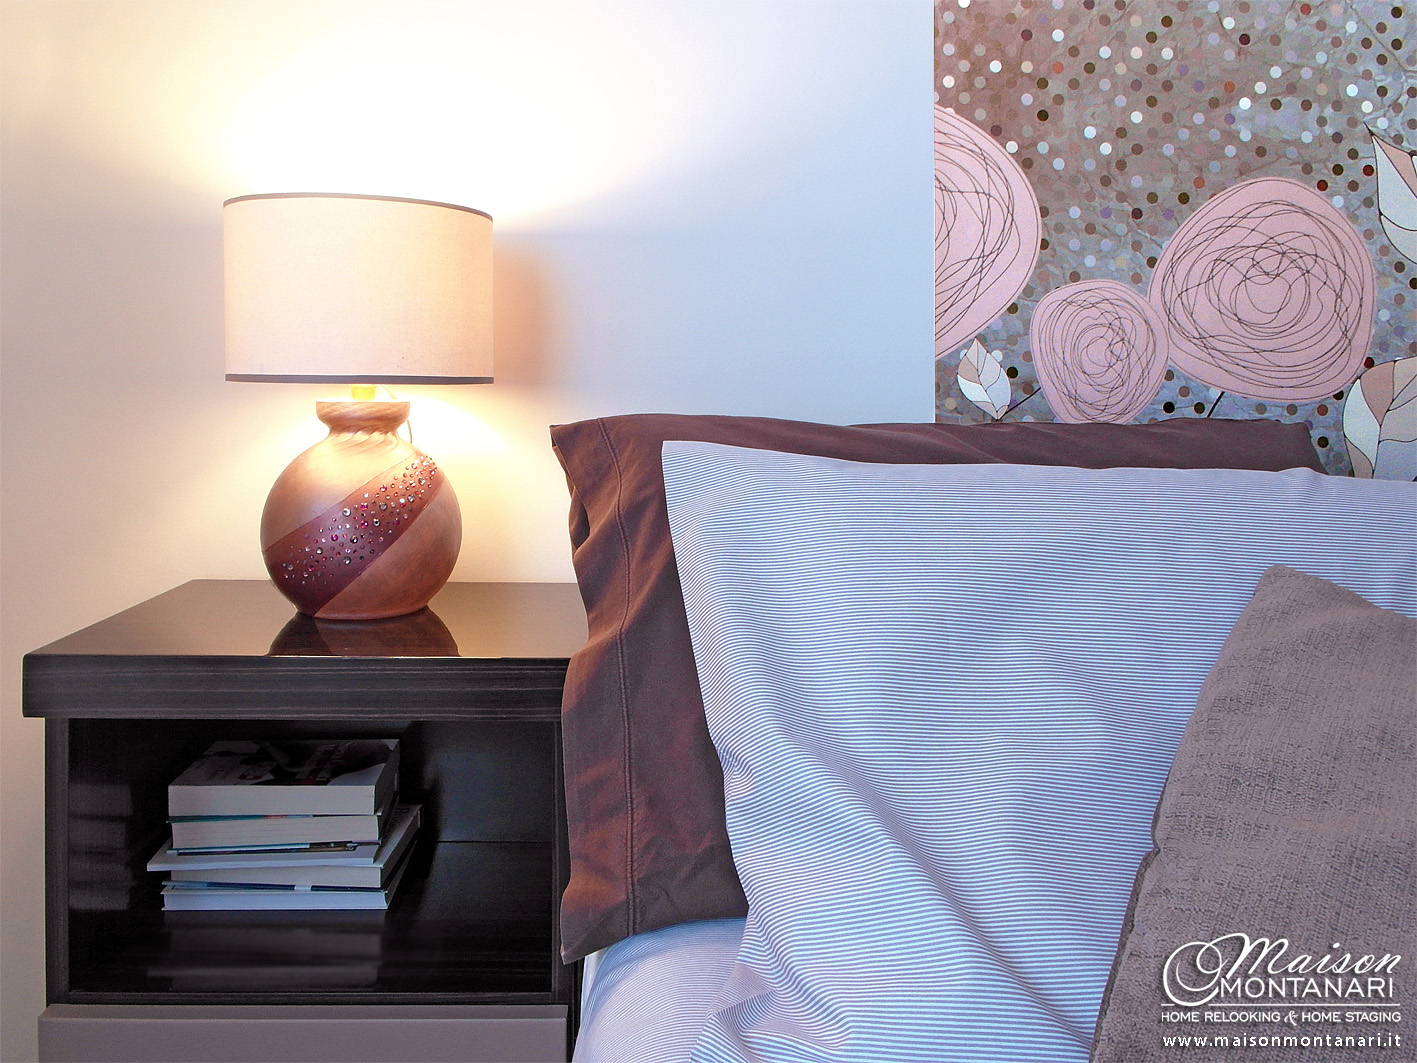 Rinnovare Mobili Camera Da Letto : Home relooking rinnovare la camera da letto in stile glamour chic